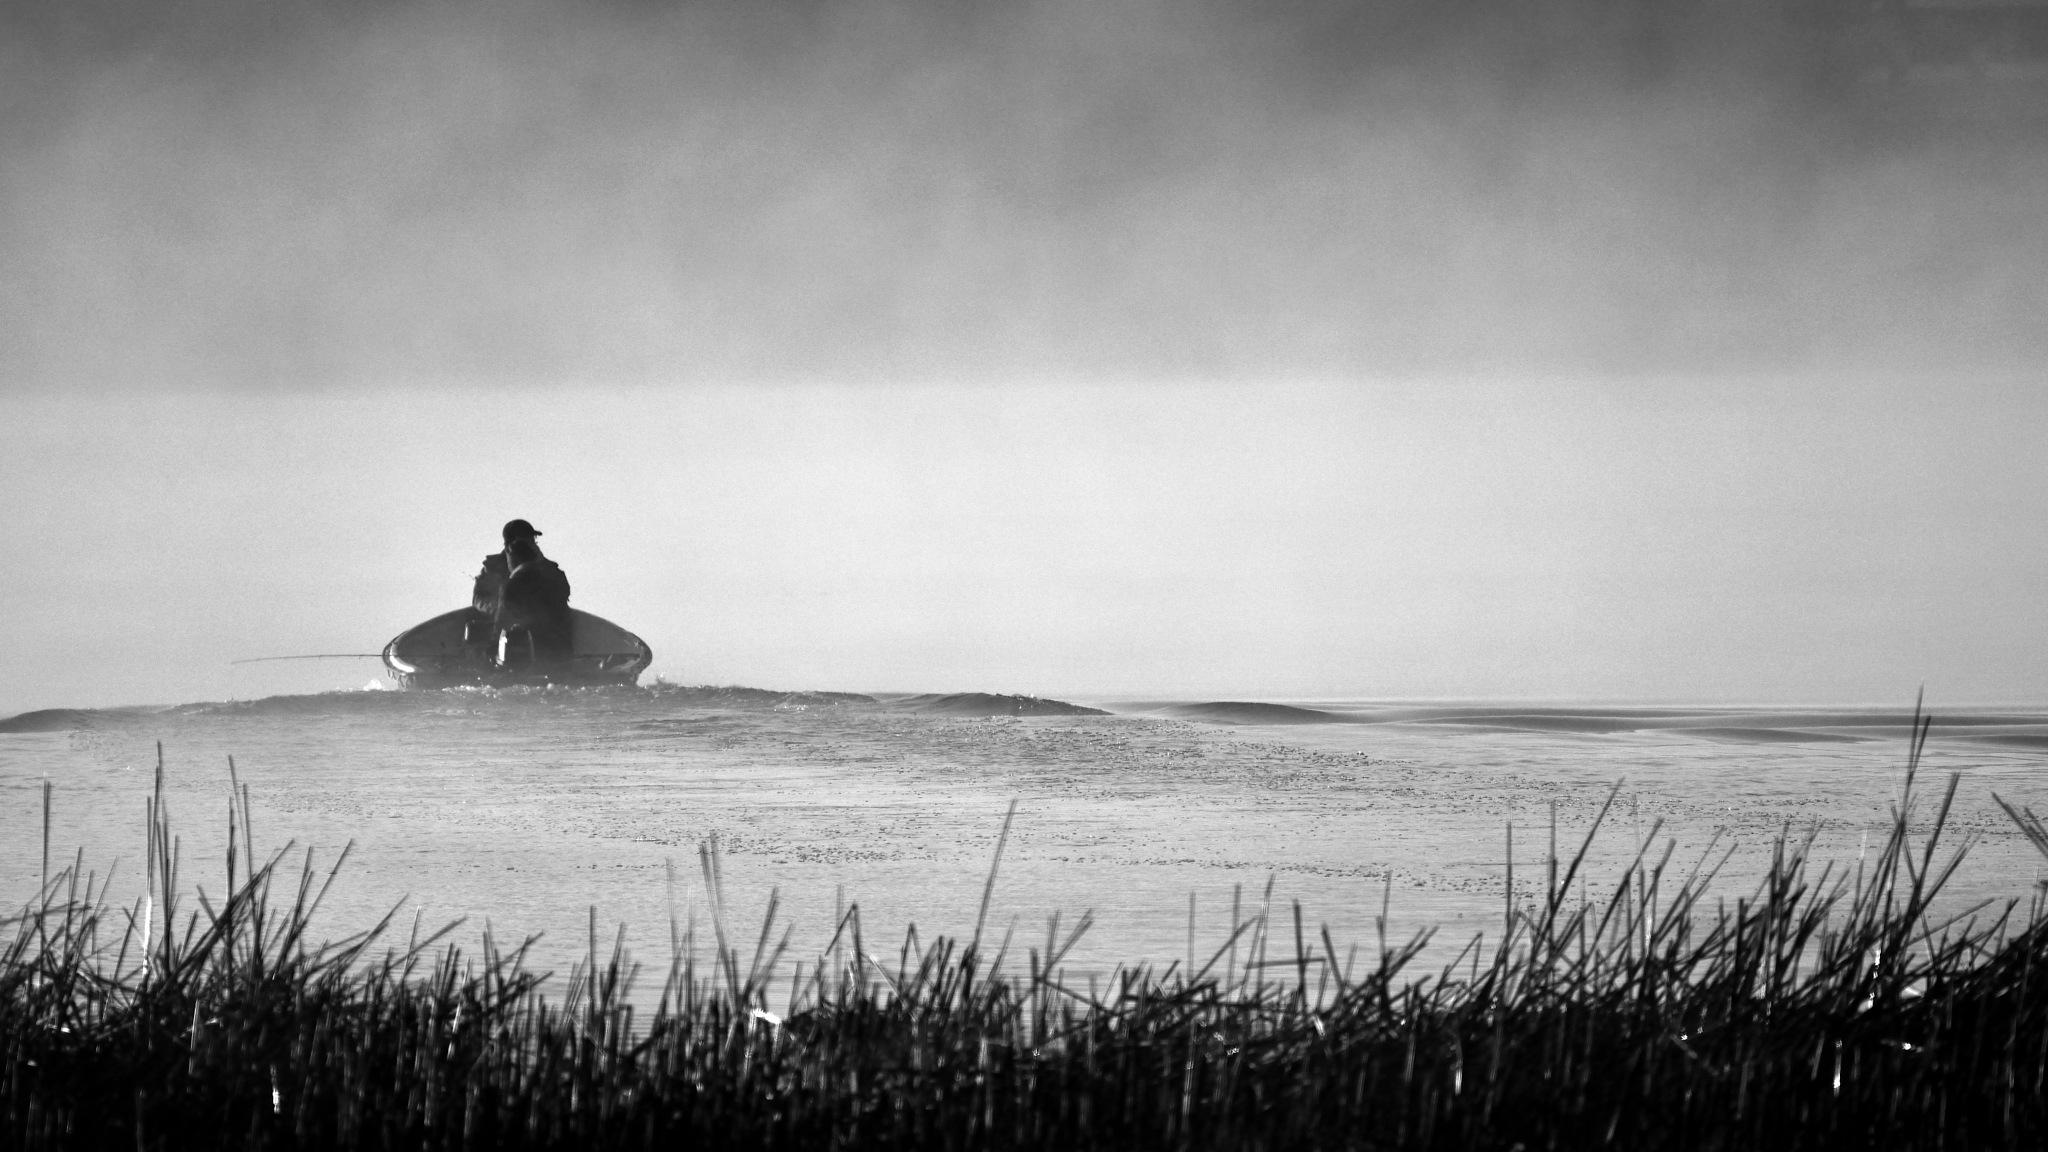 Fishermen in morning fog on the river by Art Wind